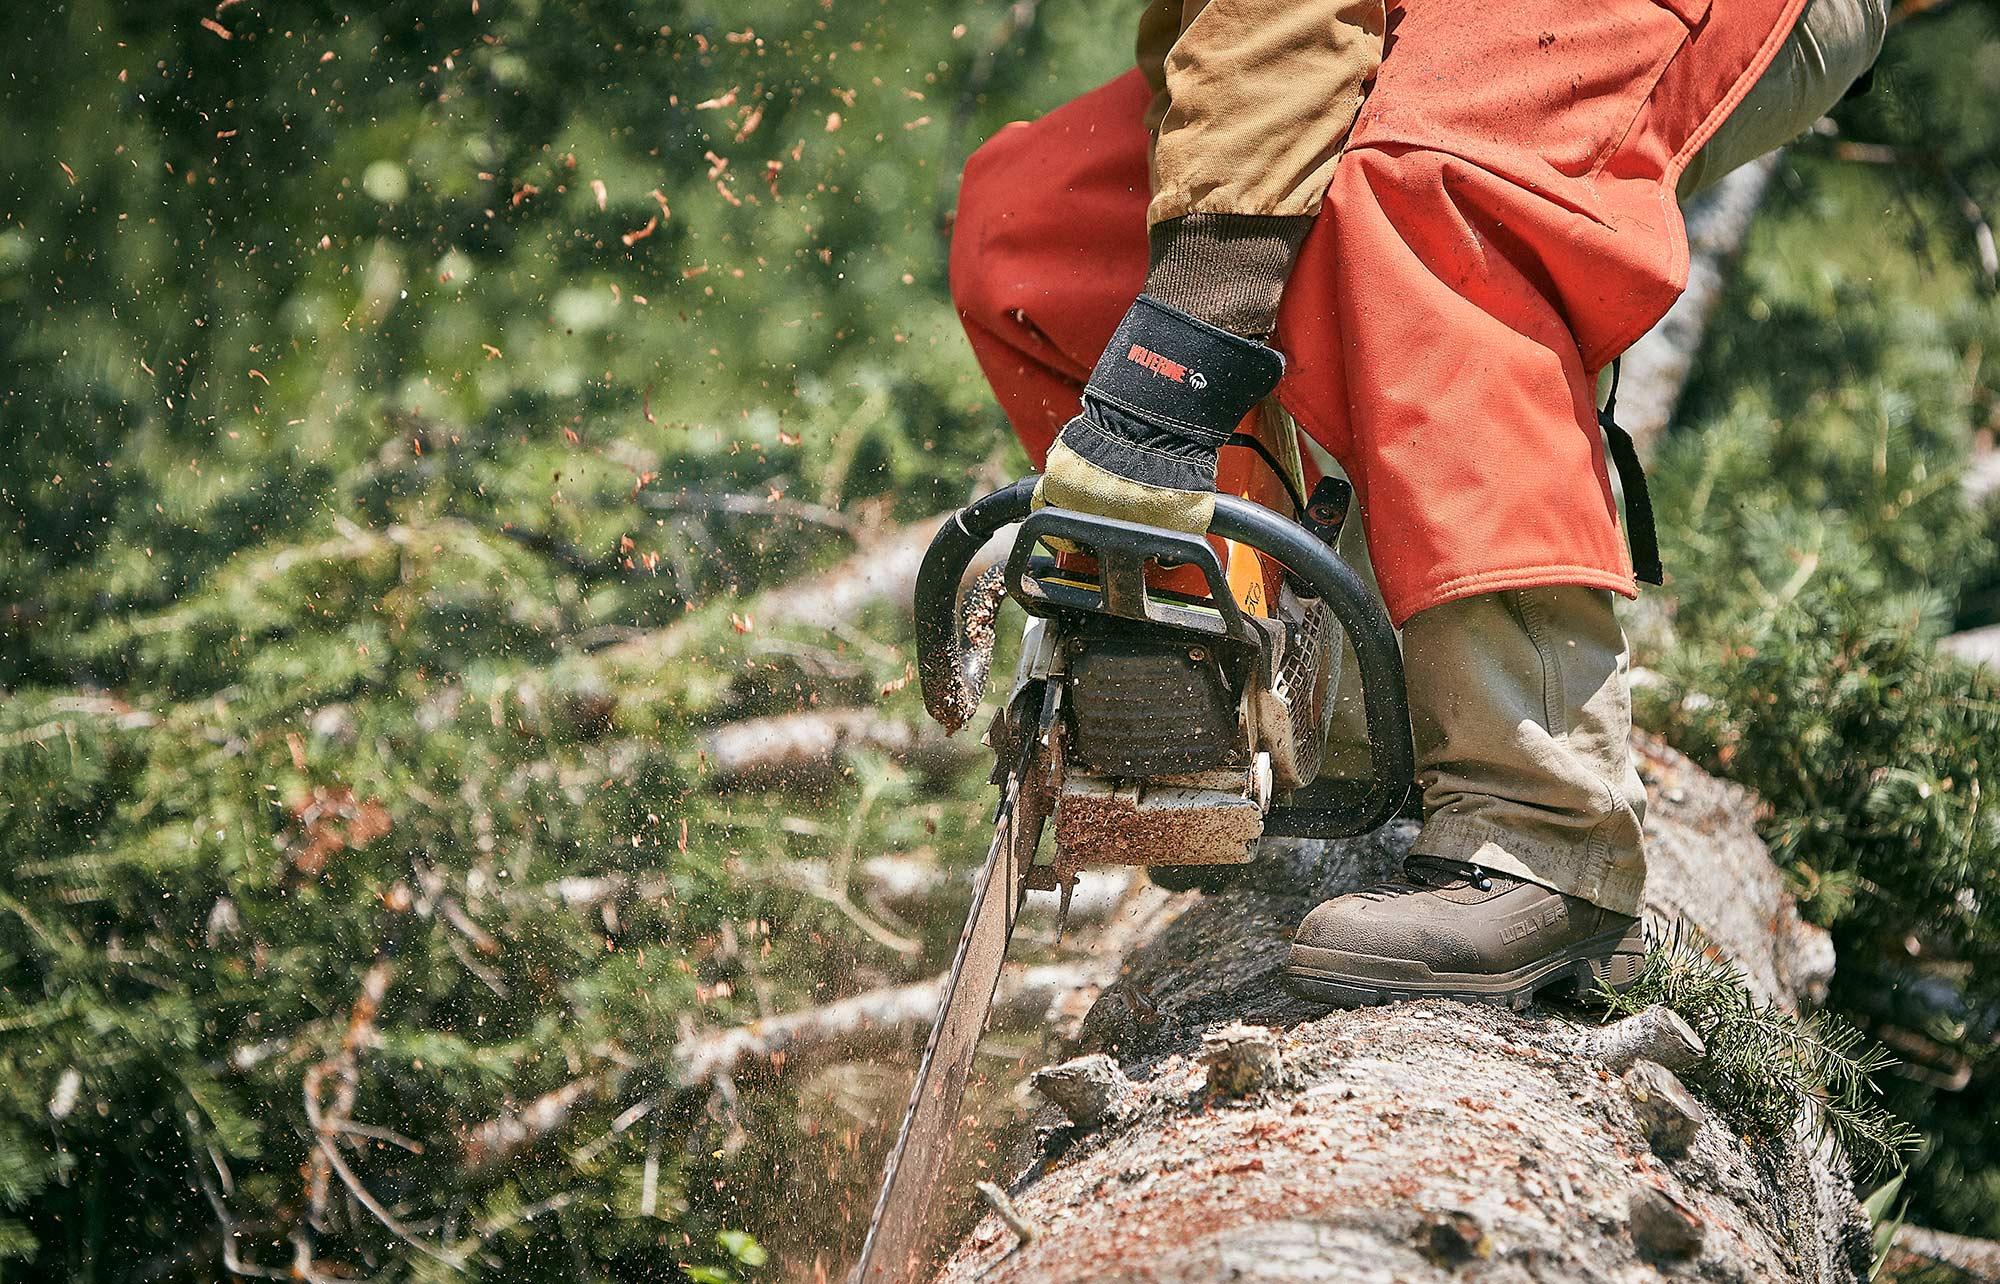 wolverine-Utah-Forestry-chain-saw-jeremy-frechette_HP.jpg